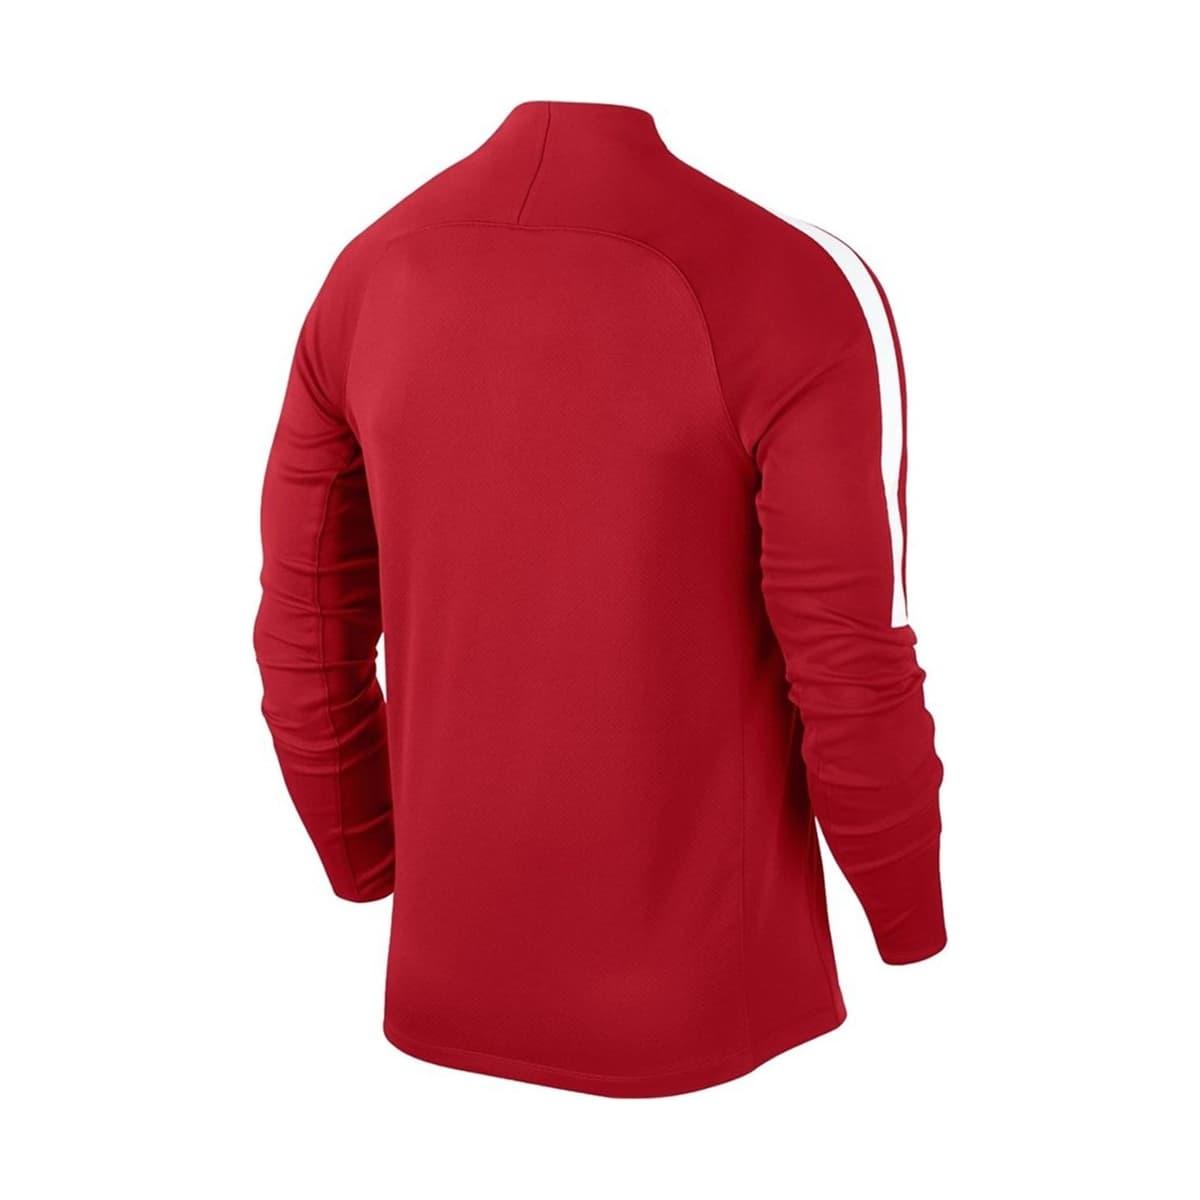 Dri-Fit Squad17 Erkek Kırmızı Eşofman Üstü (831569-657)